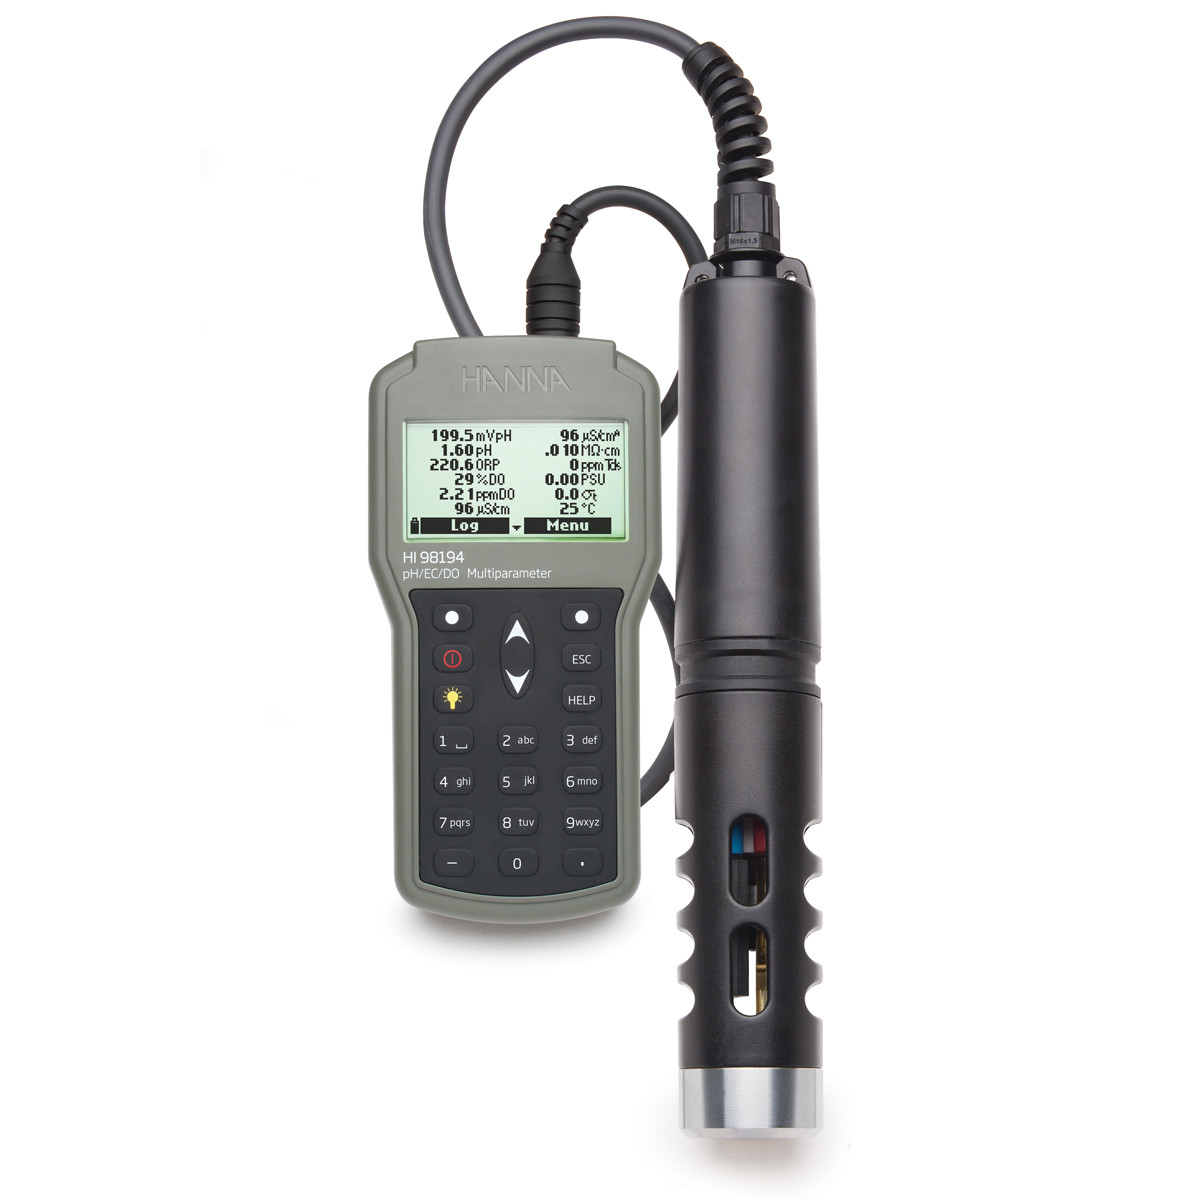 Multiparameter pH/ORP/EC/TDS/Salinity/DO/Pressure/ Temperature Waterproof Meter